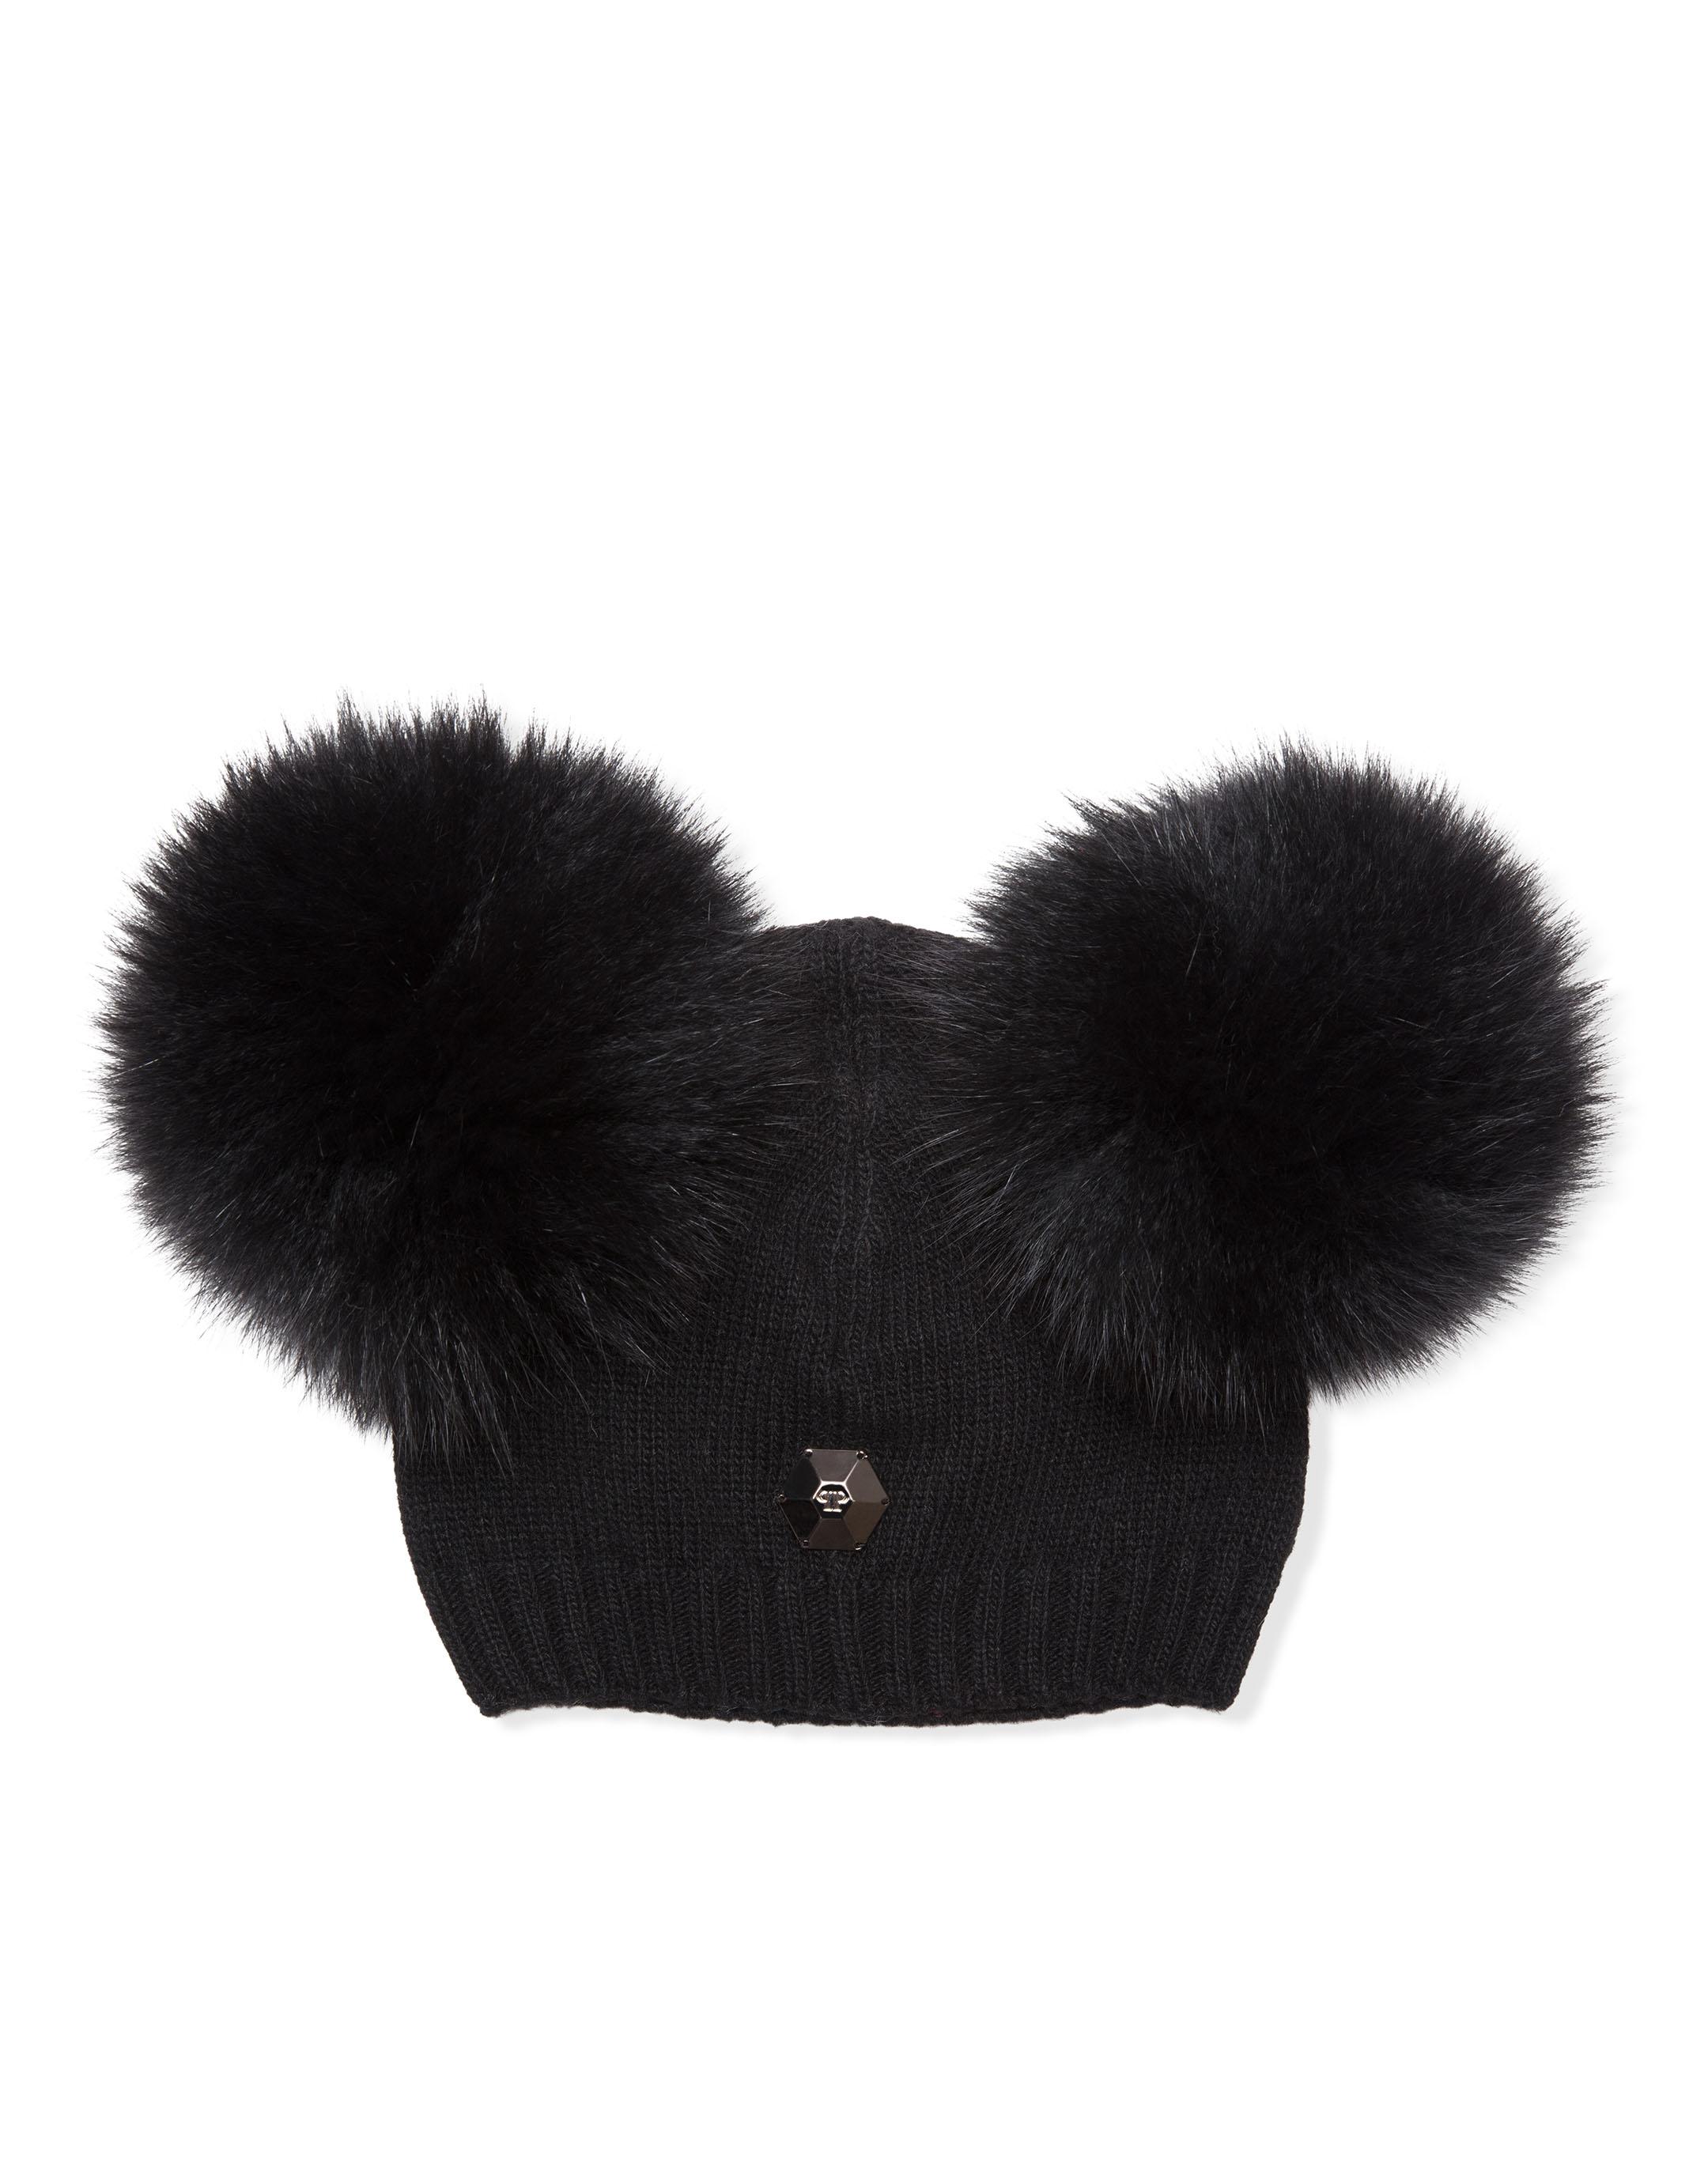 65d21a89f8c Hat